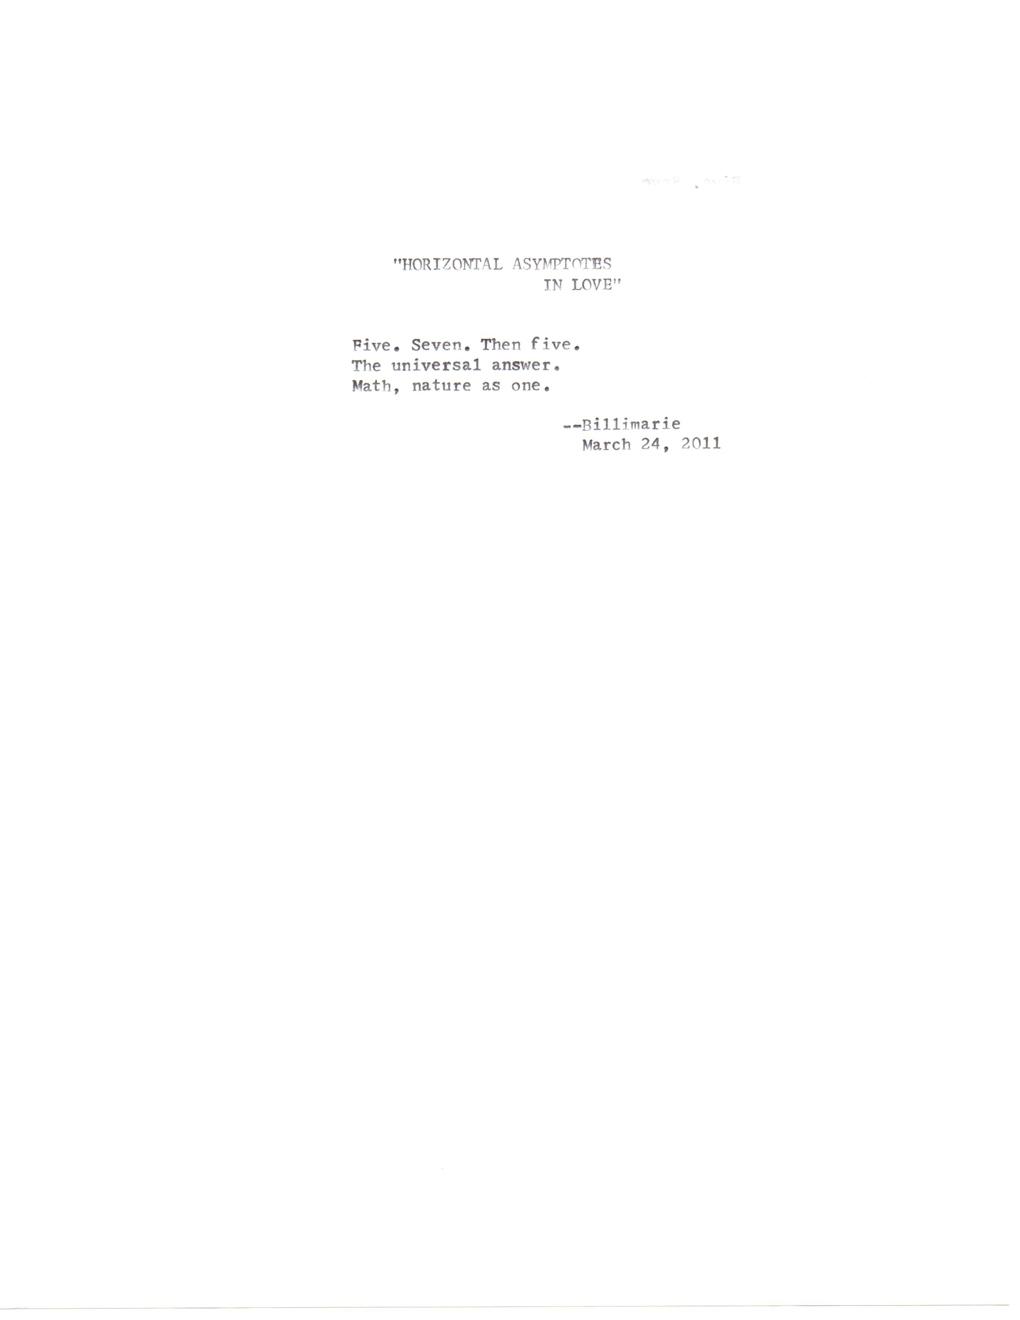 """HORIZONTAL ASYMPTOTES IN LOVE"" | typewriter poetry"